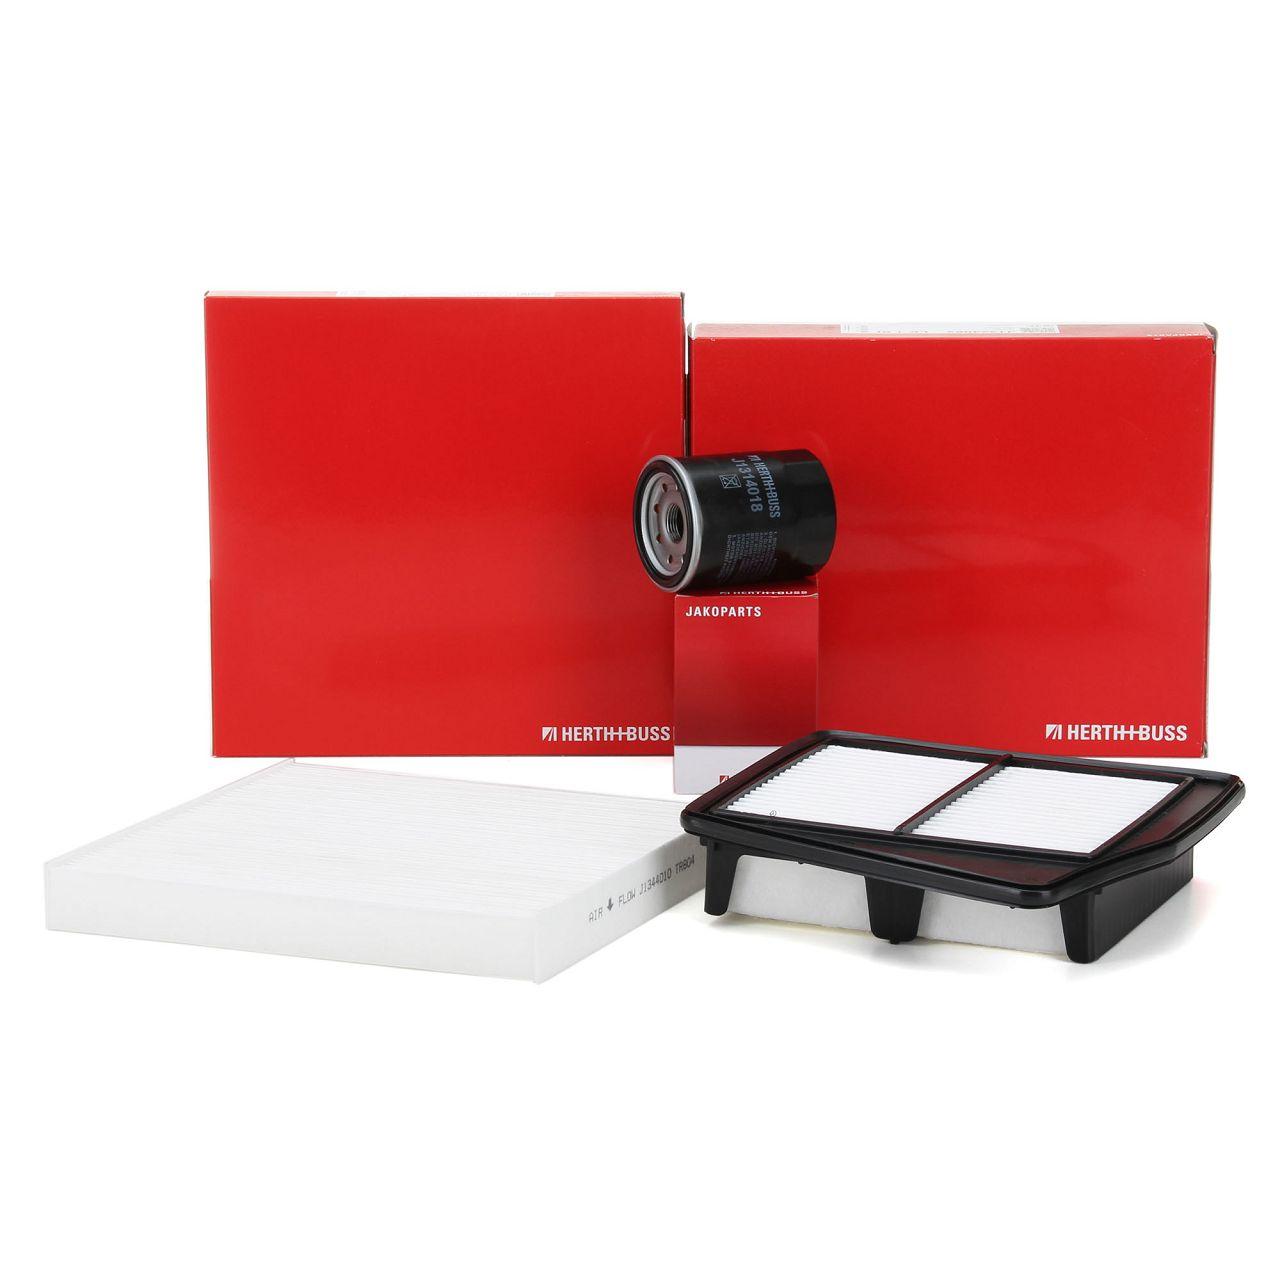 HERTH+BUSS JAKOPARTS Filterpaket Filterset für HONDA ACCORD VIII 2.0i 156 PS